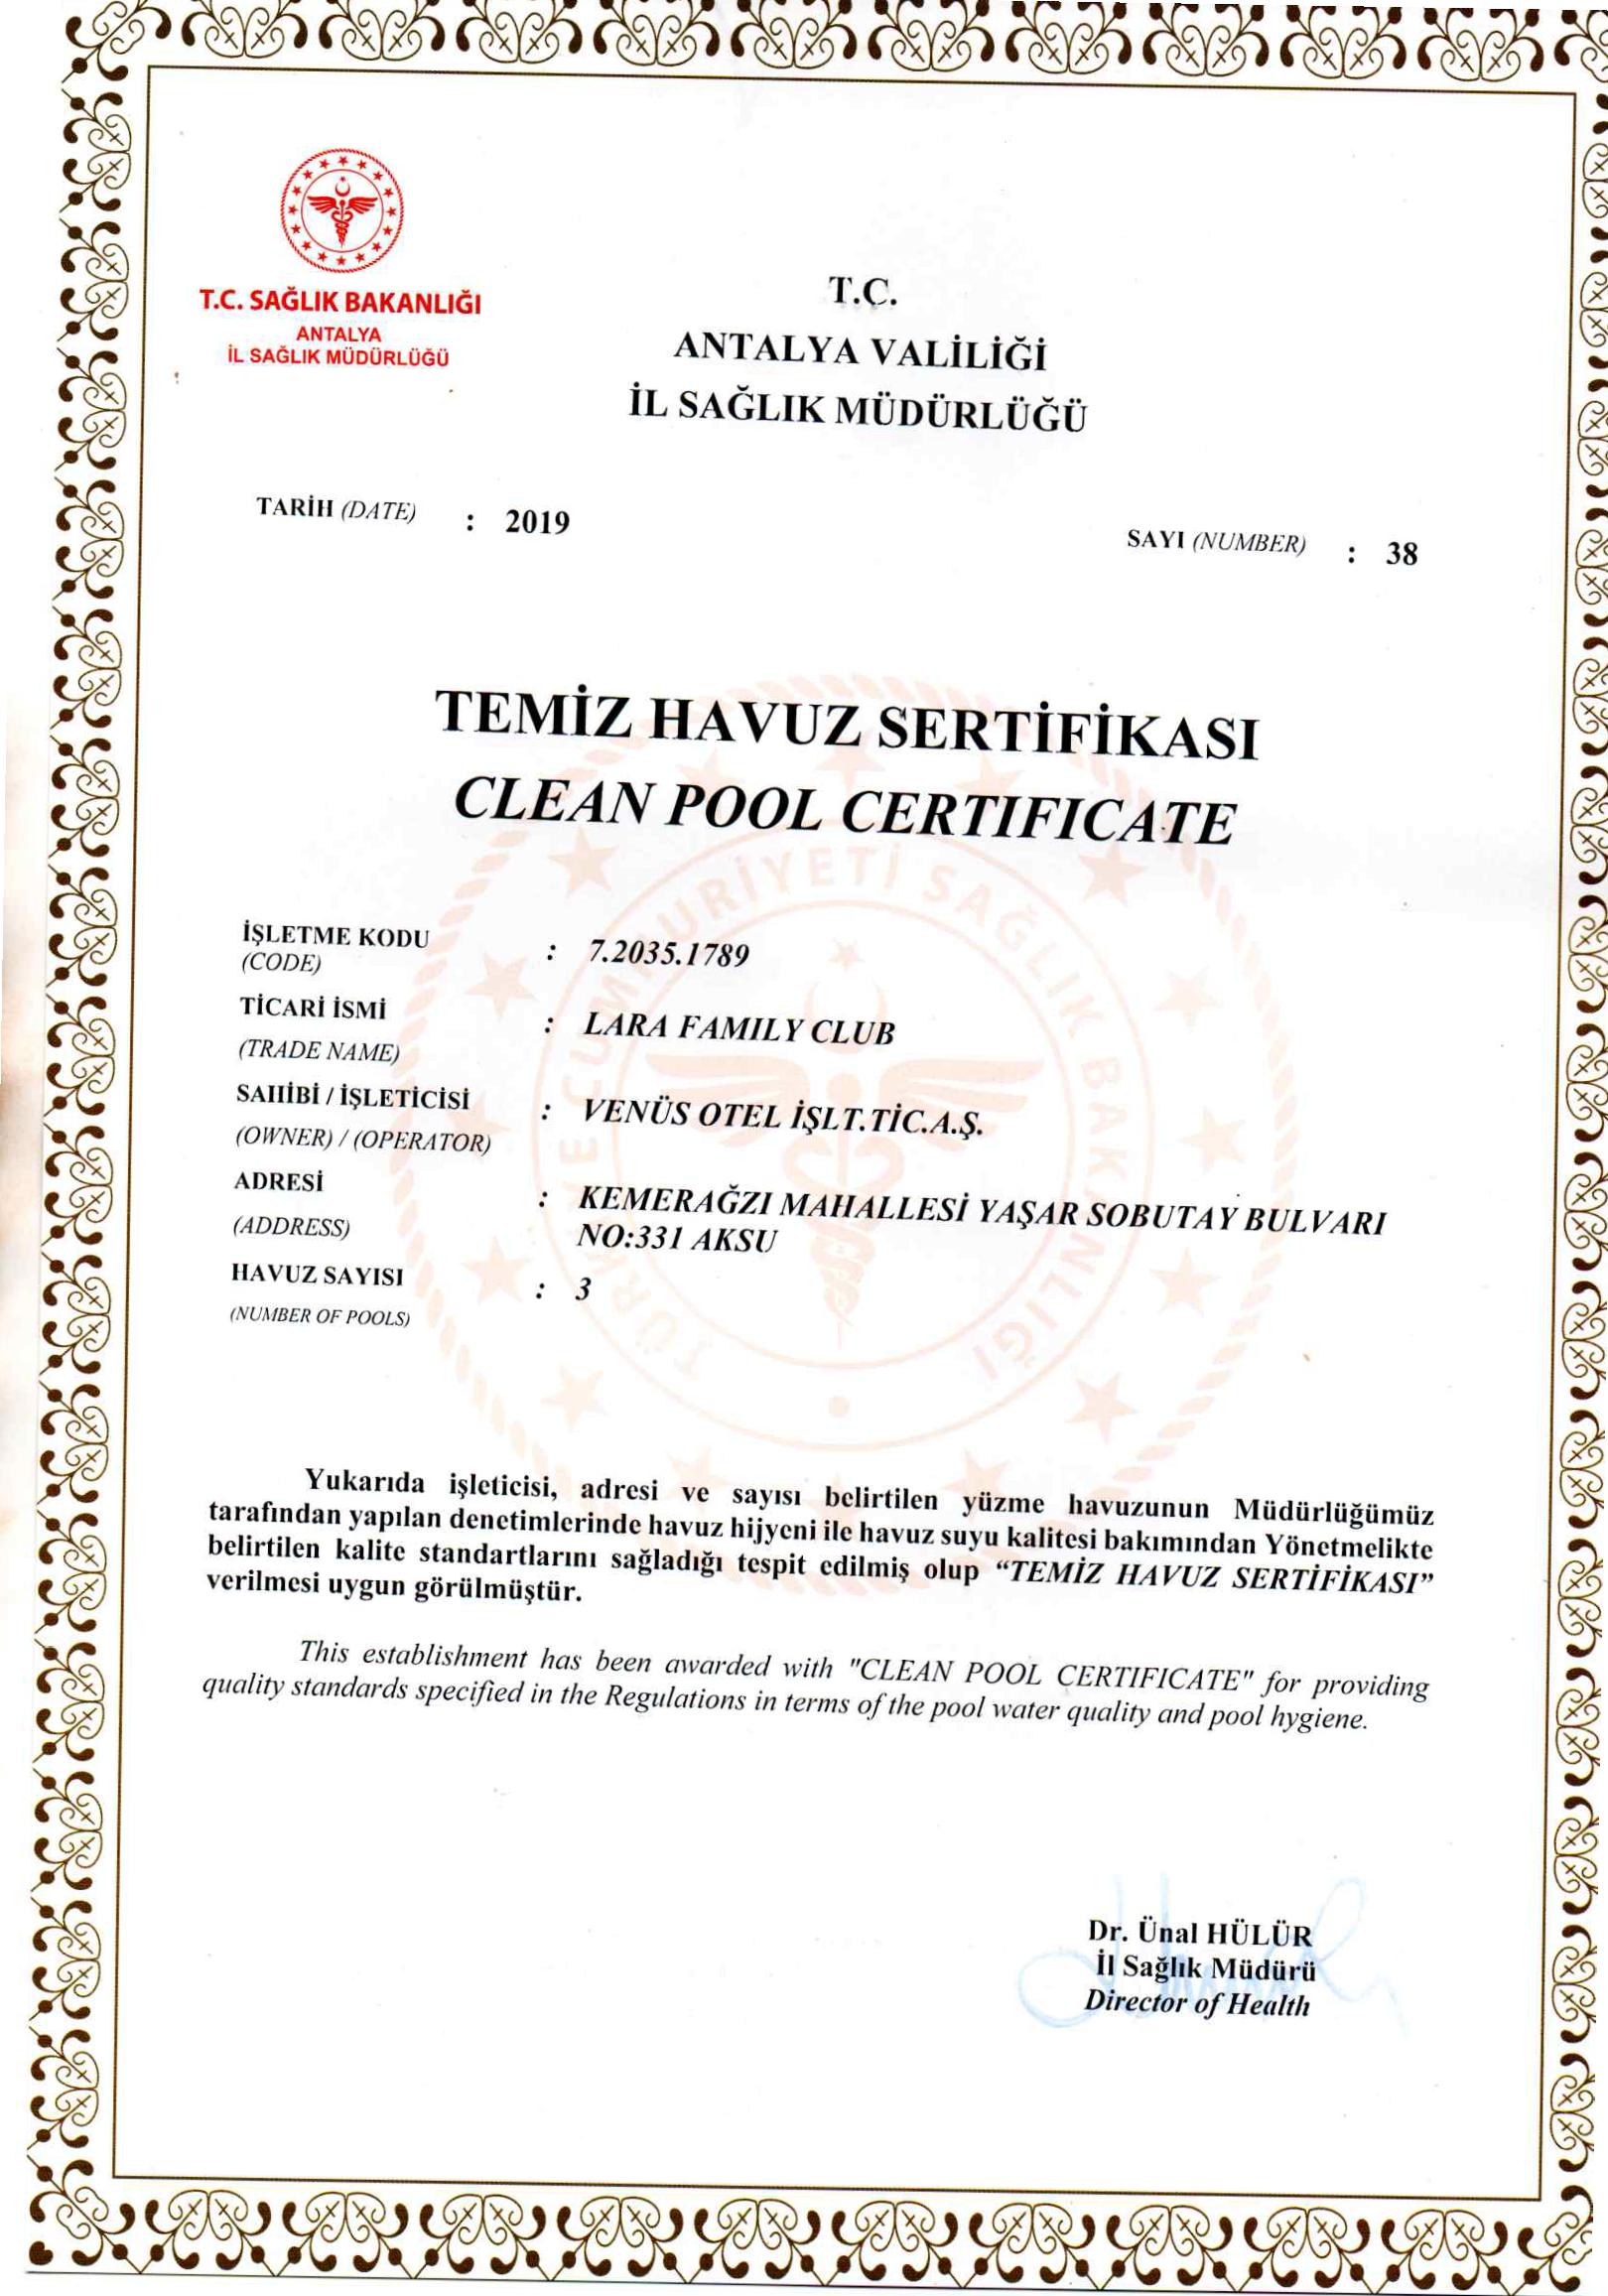 temiz_havuz_sertifikasi.png